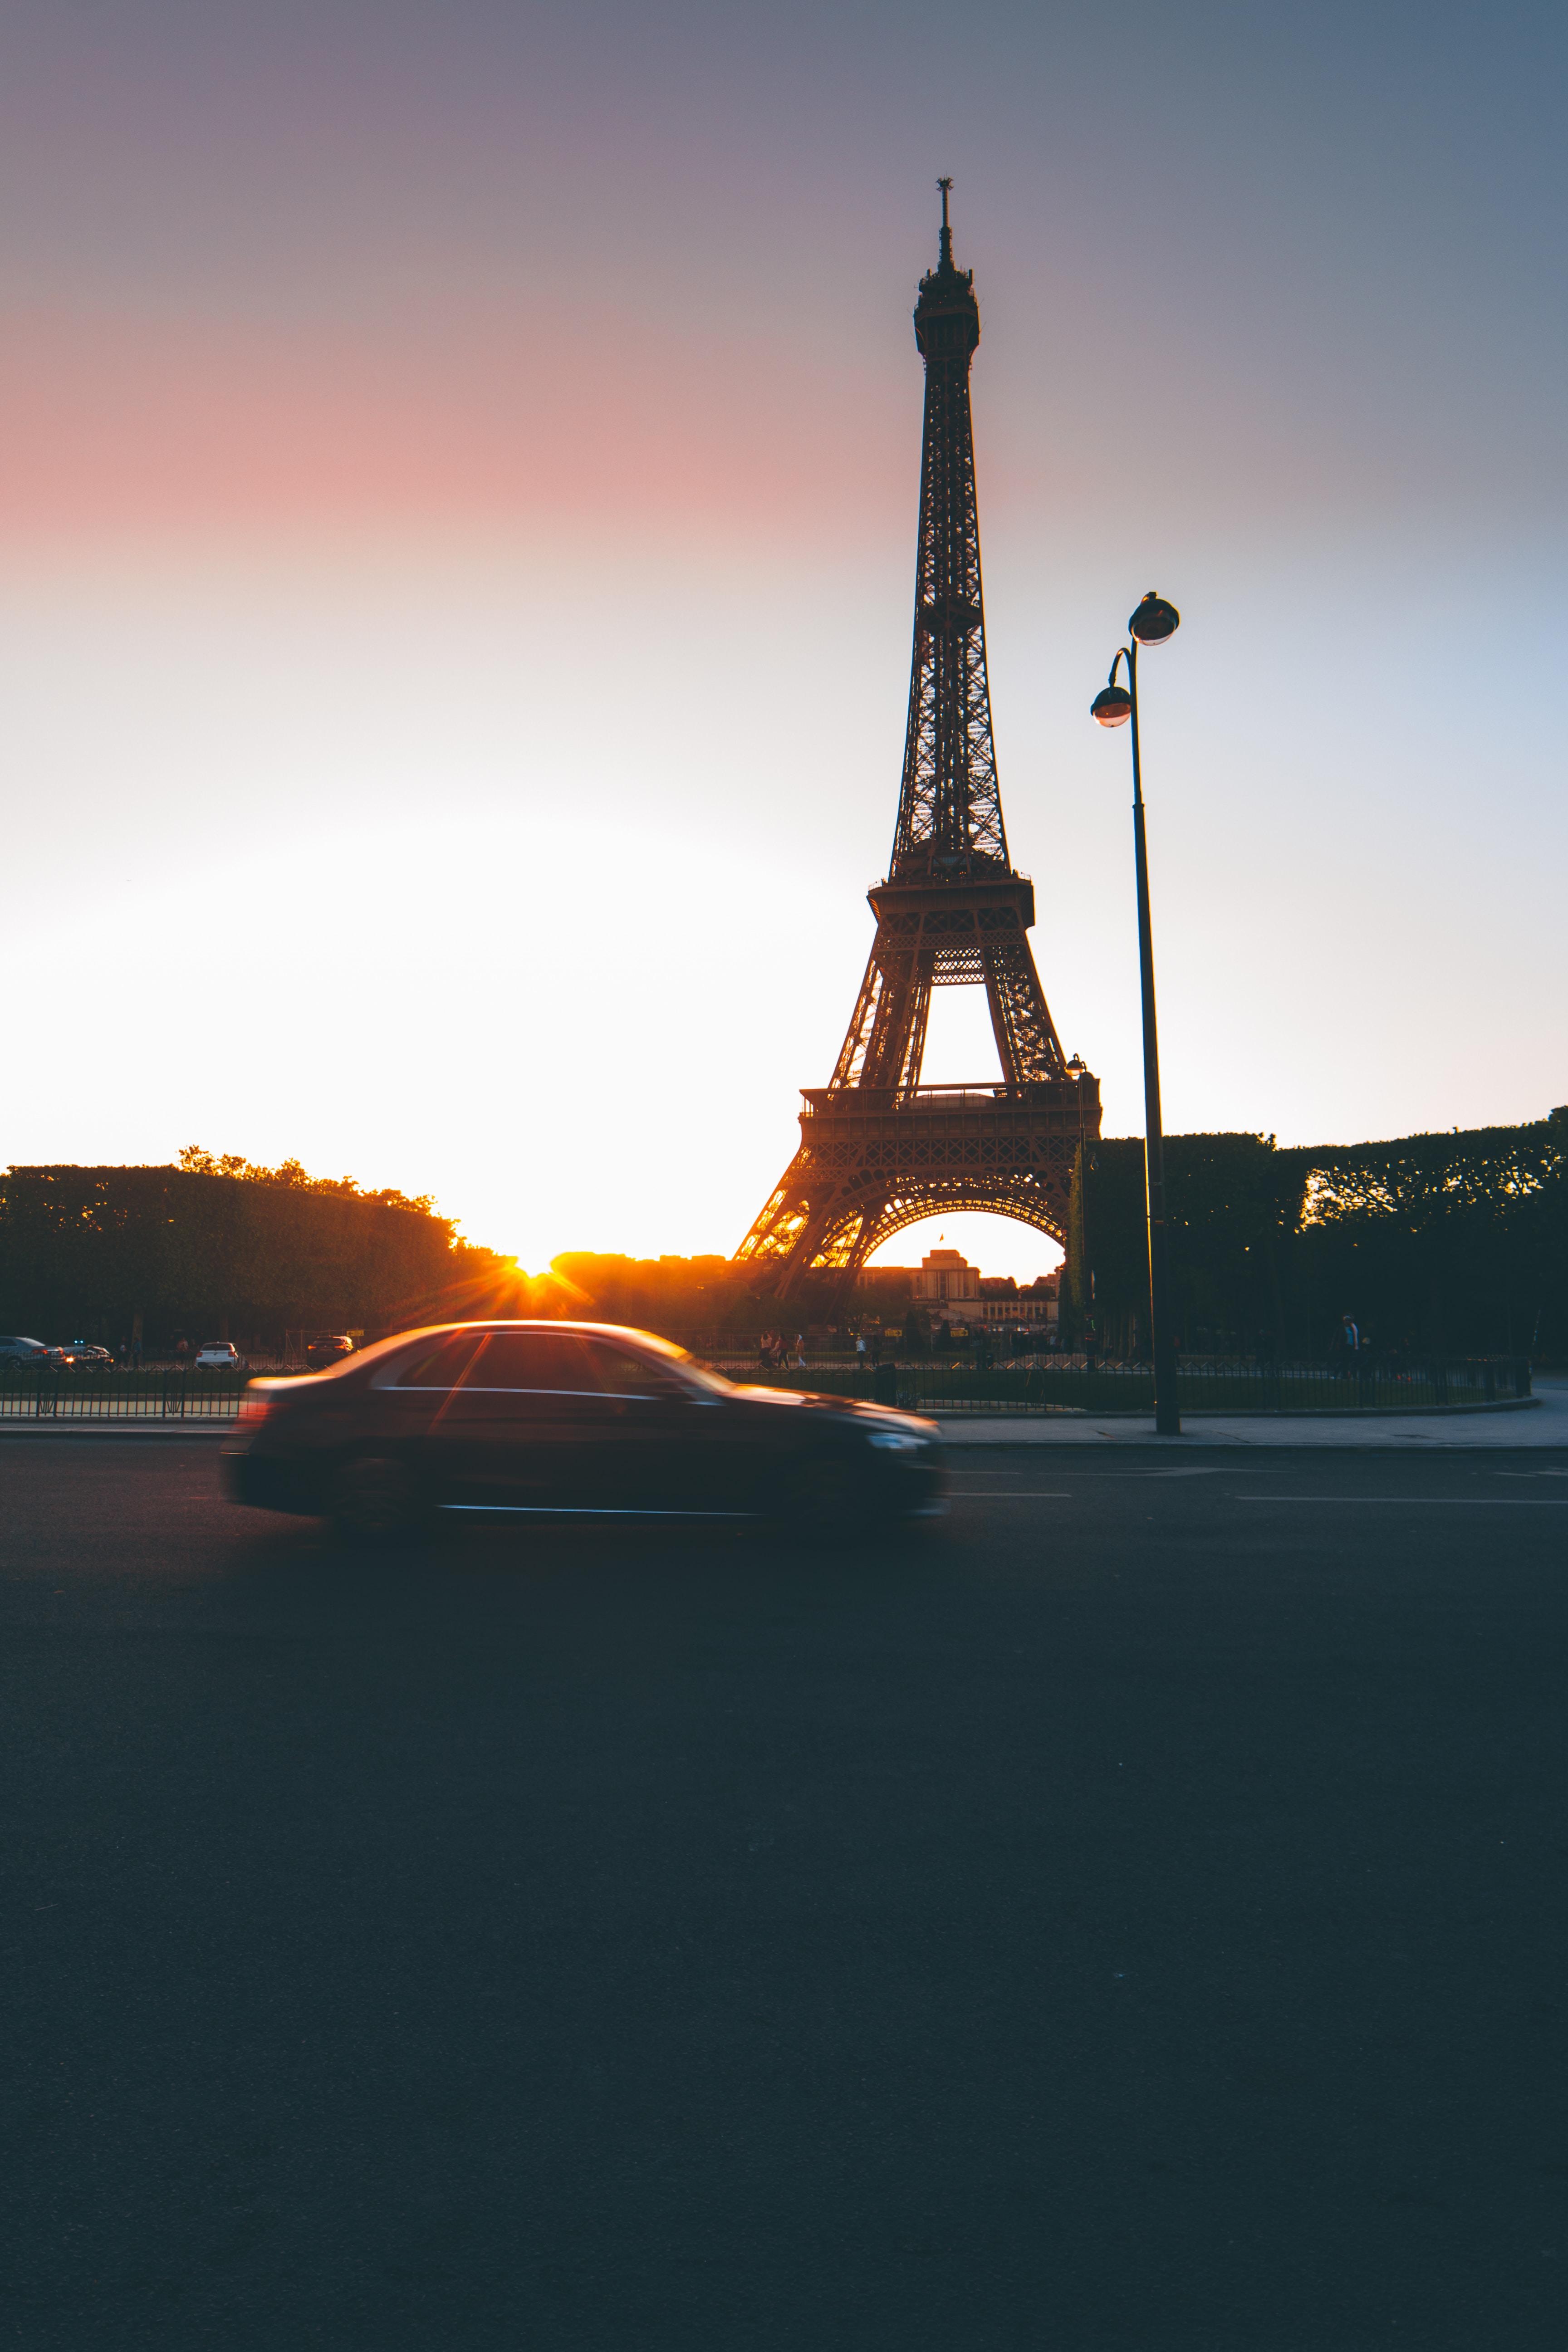 car near Eiffel Tower at golden hour